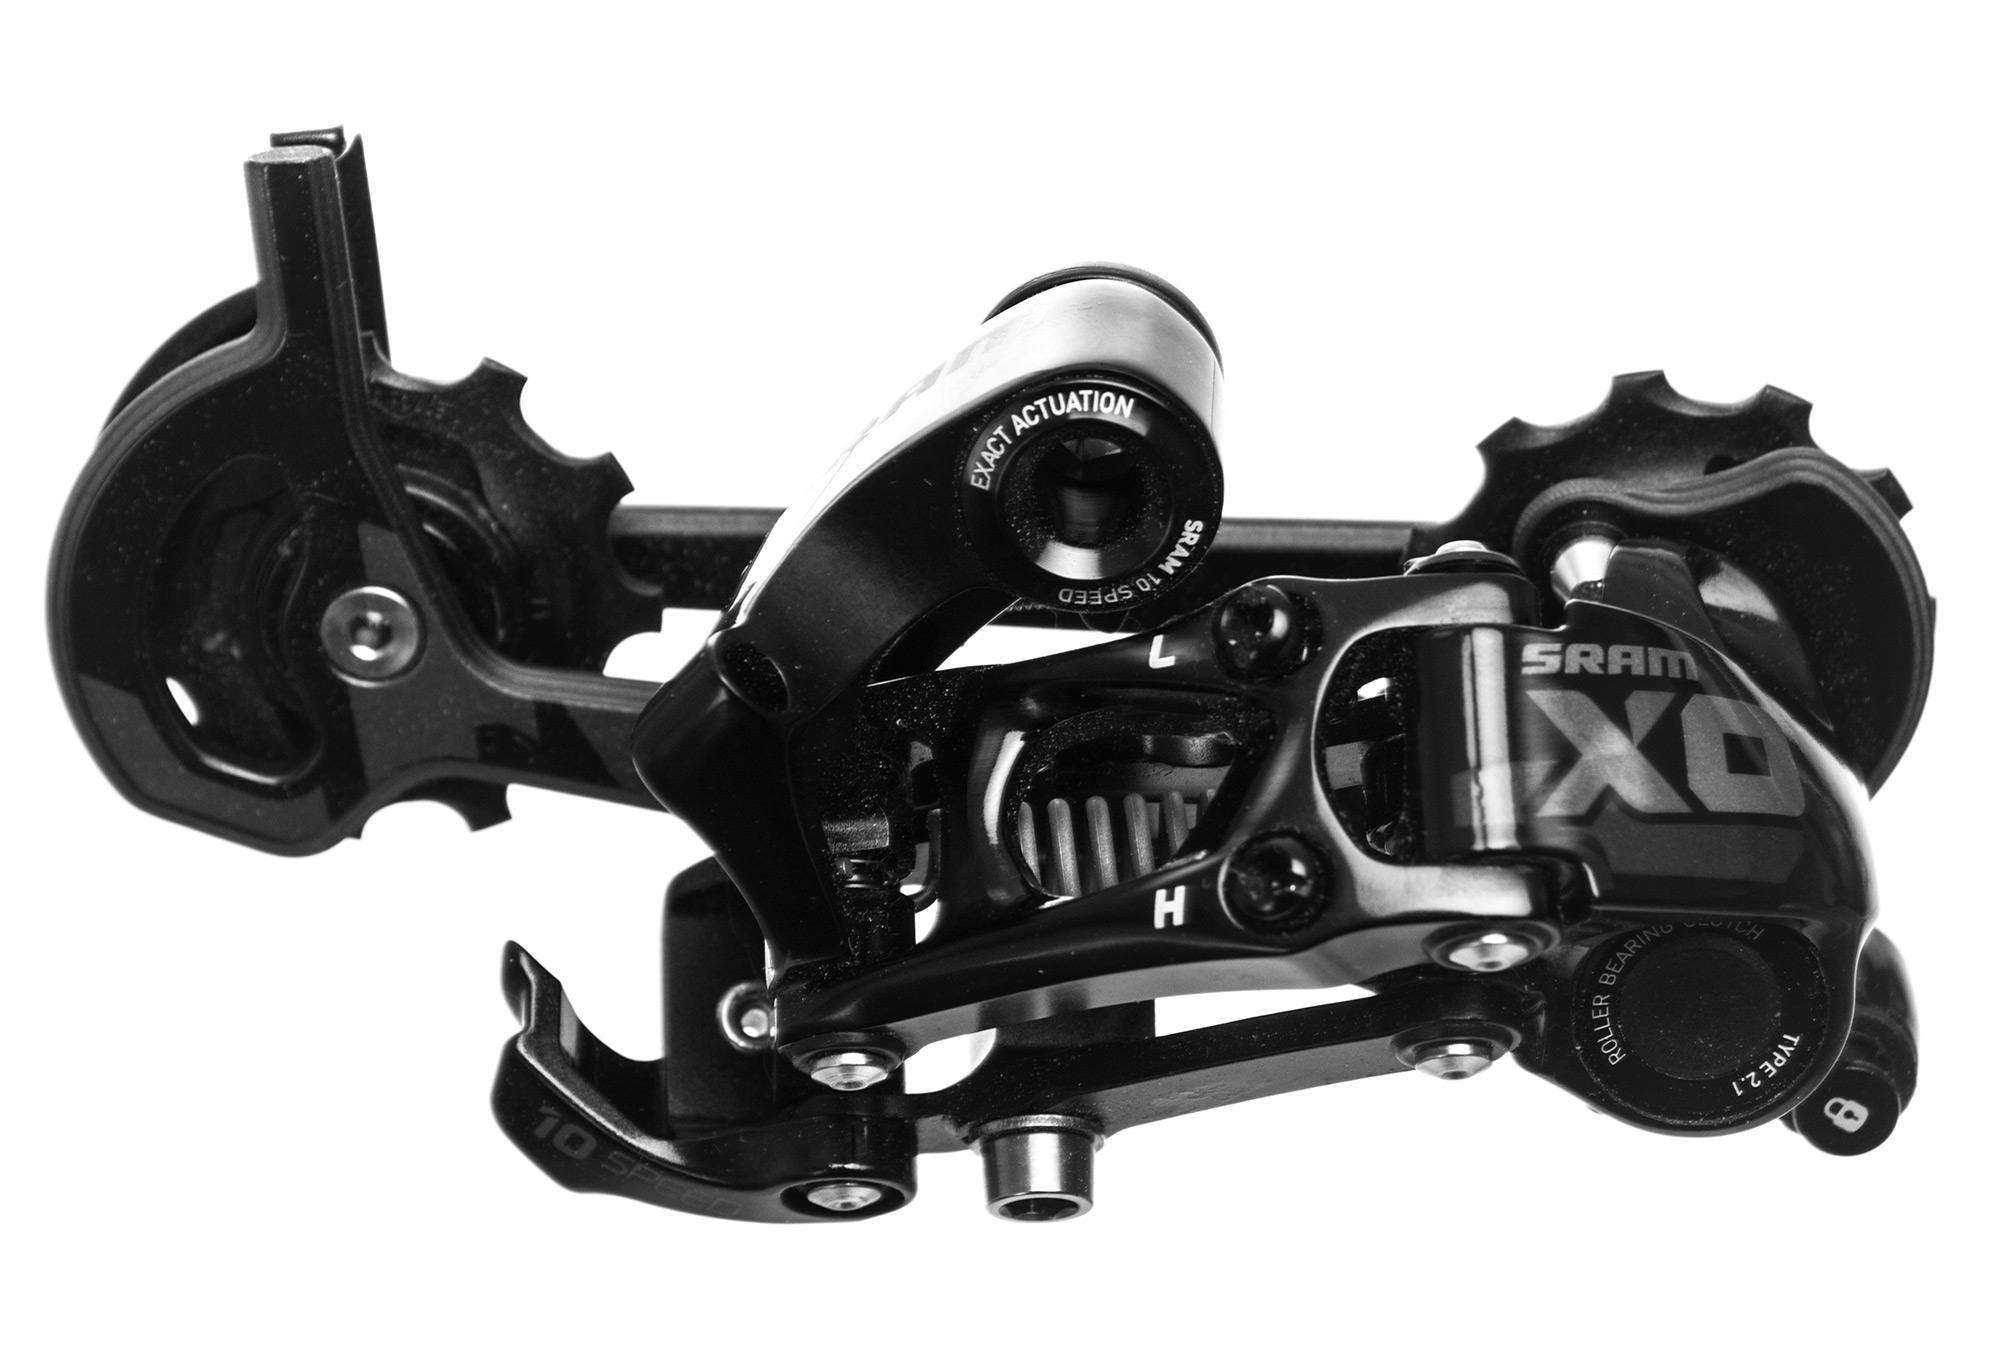 Sram X0 Type 2 10 Speed Rear Derailleur Long Cage Black Alltricks Com